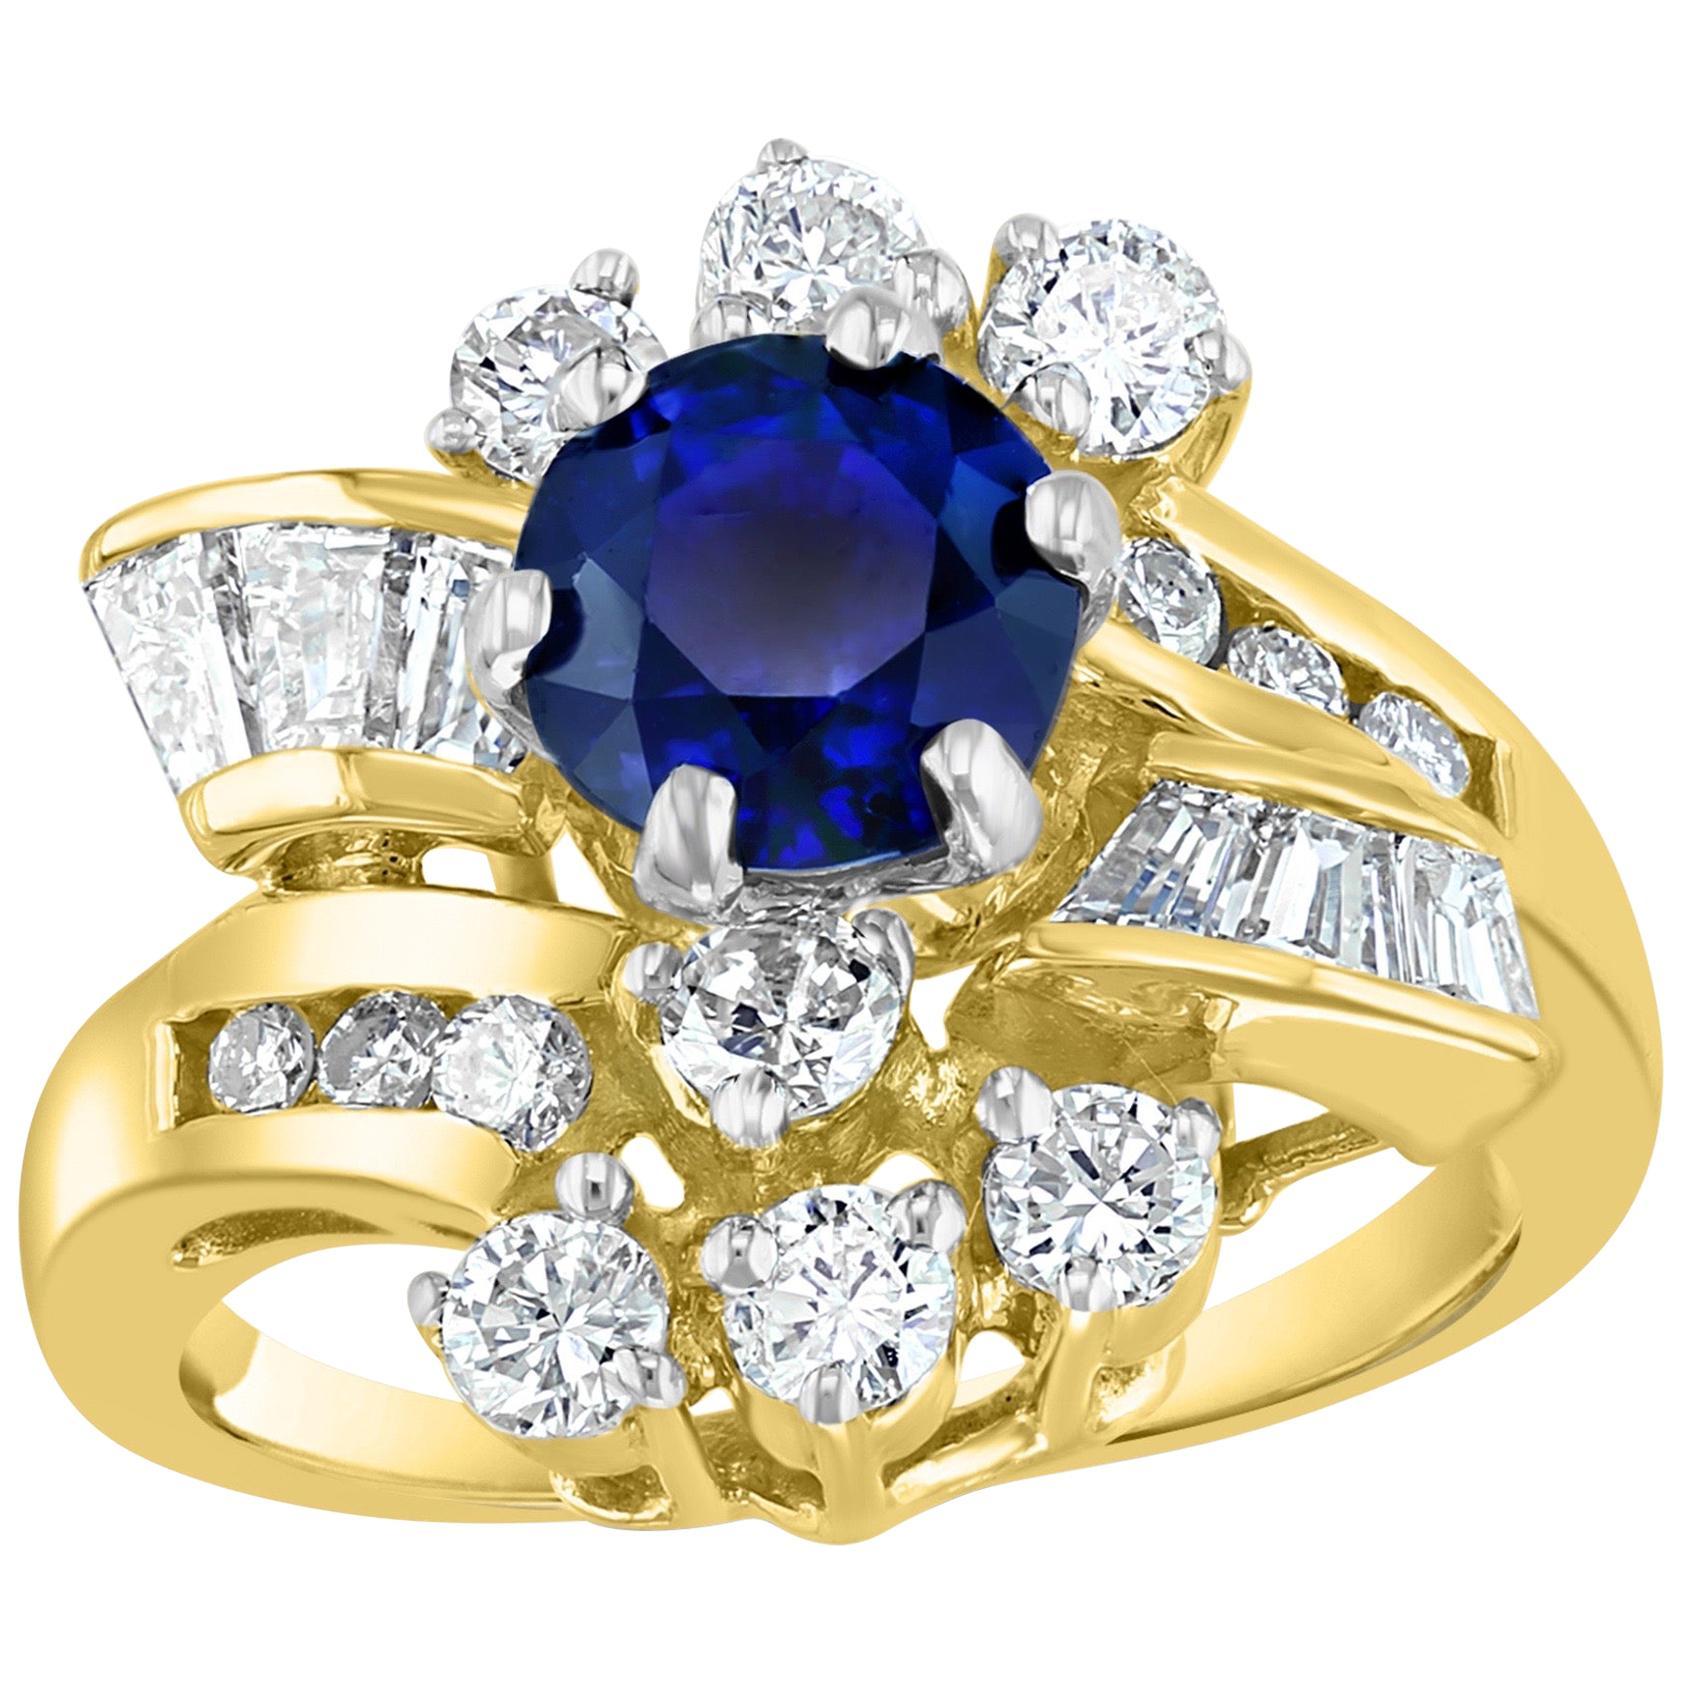 1 Carat Round Blue Sapphire & 1.65 Carat Diamond Cocktail Ring in 14 Karat Gold